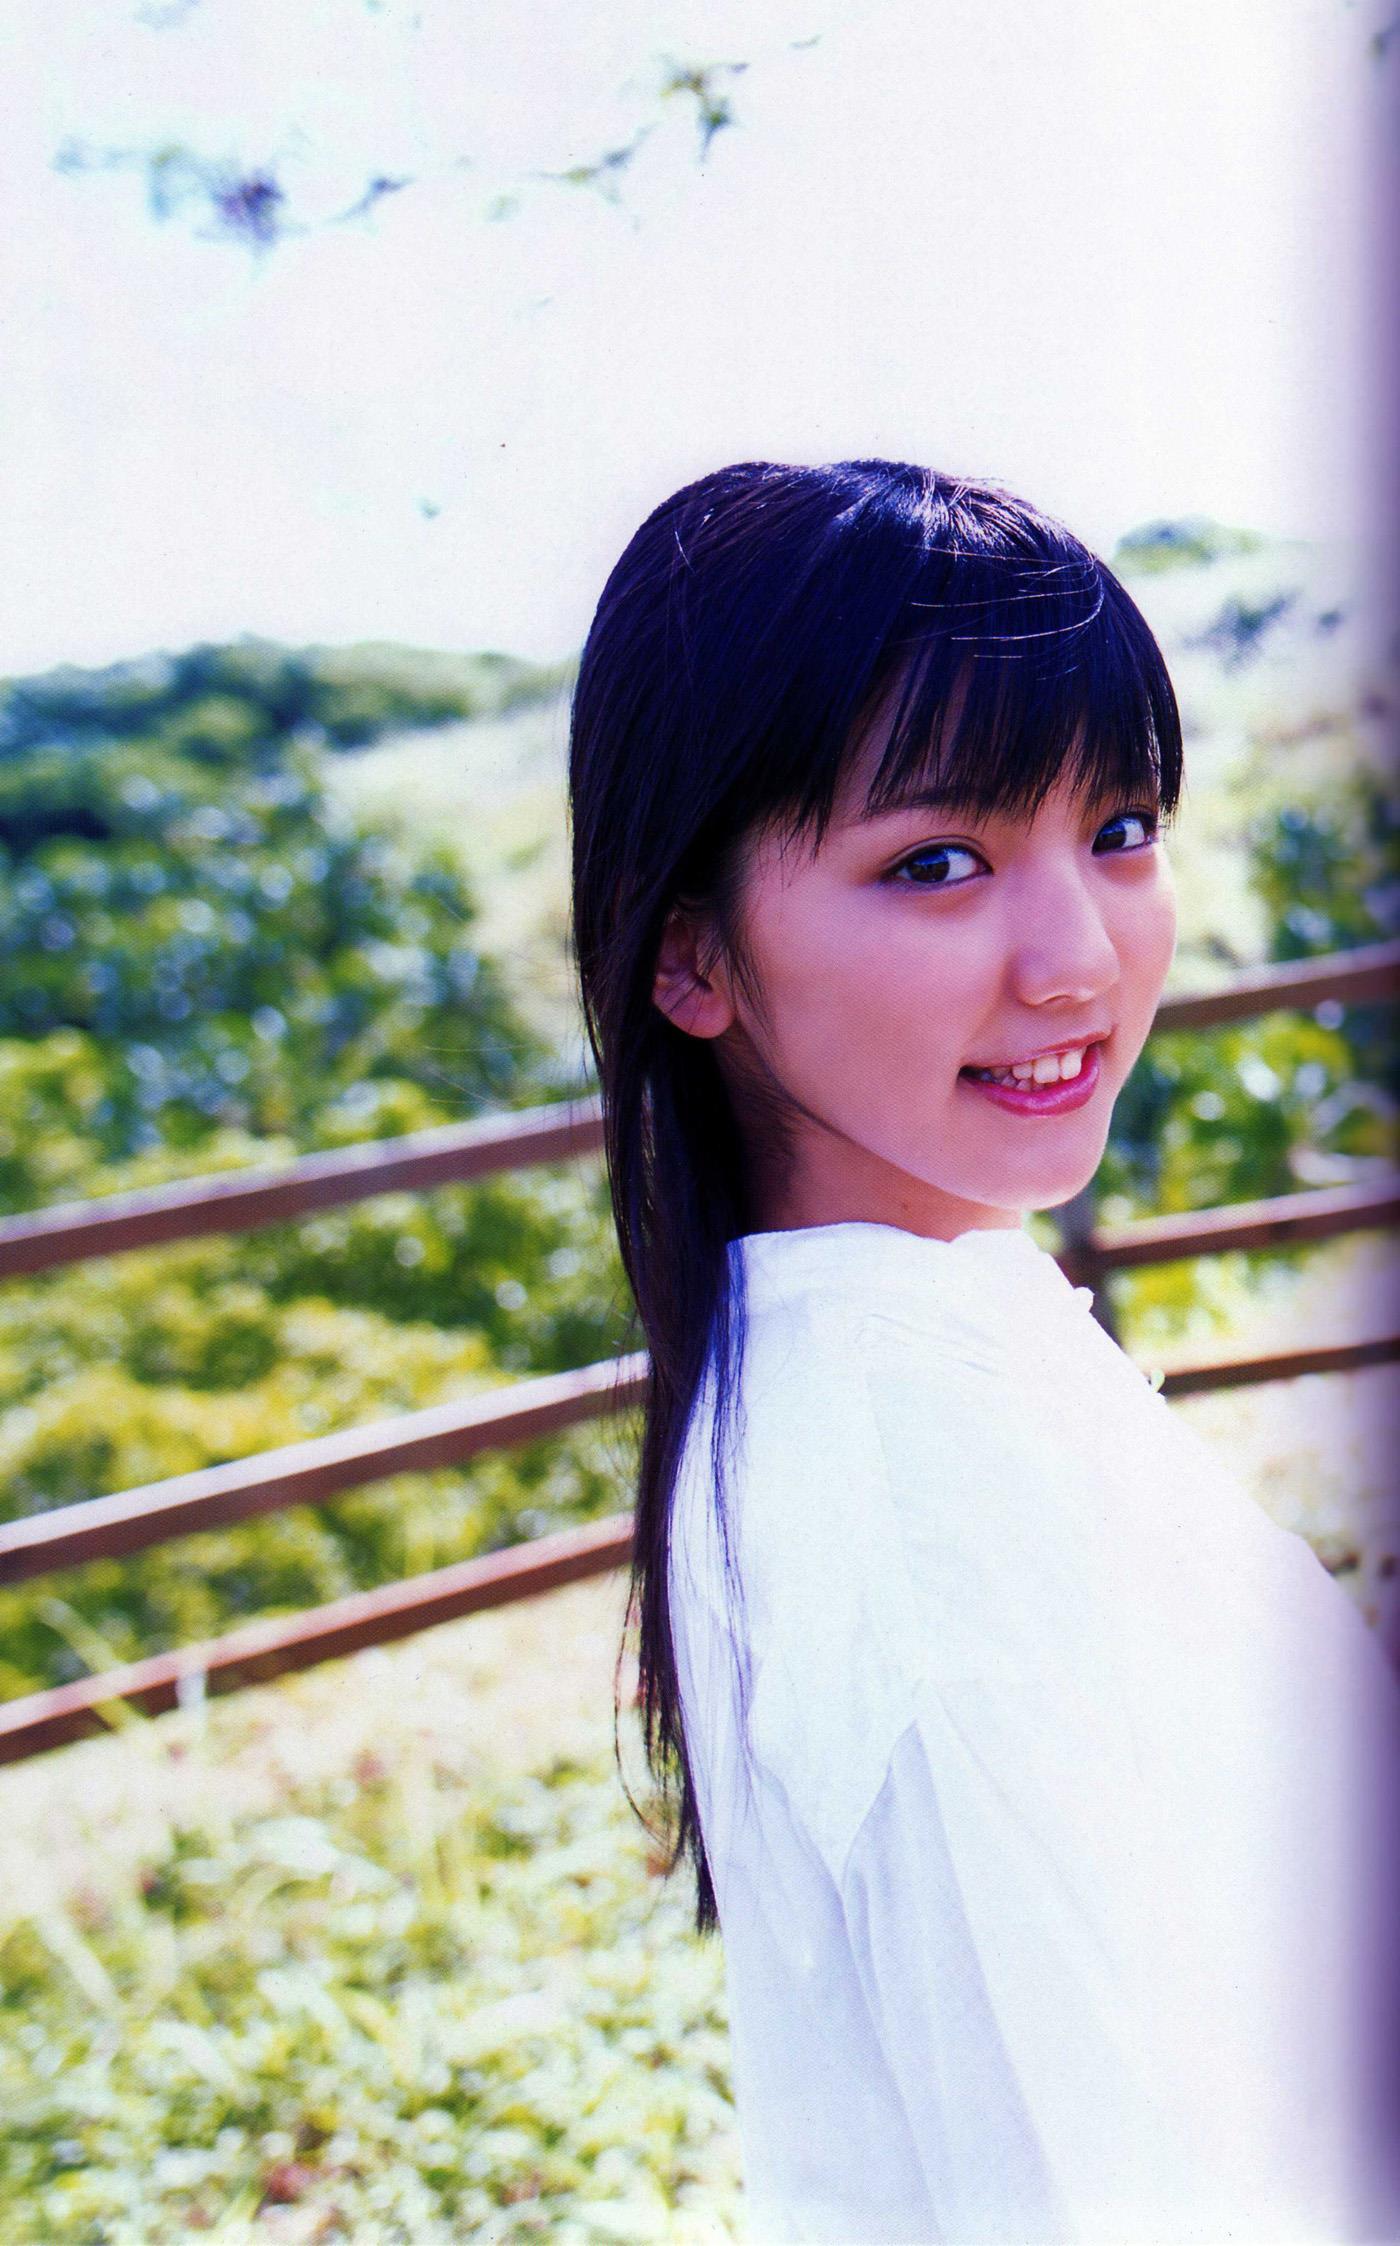 真野恵里菜 エロ画像 95